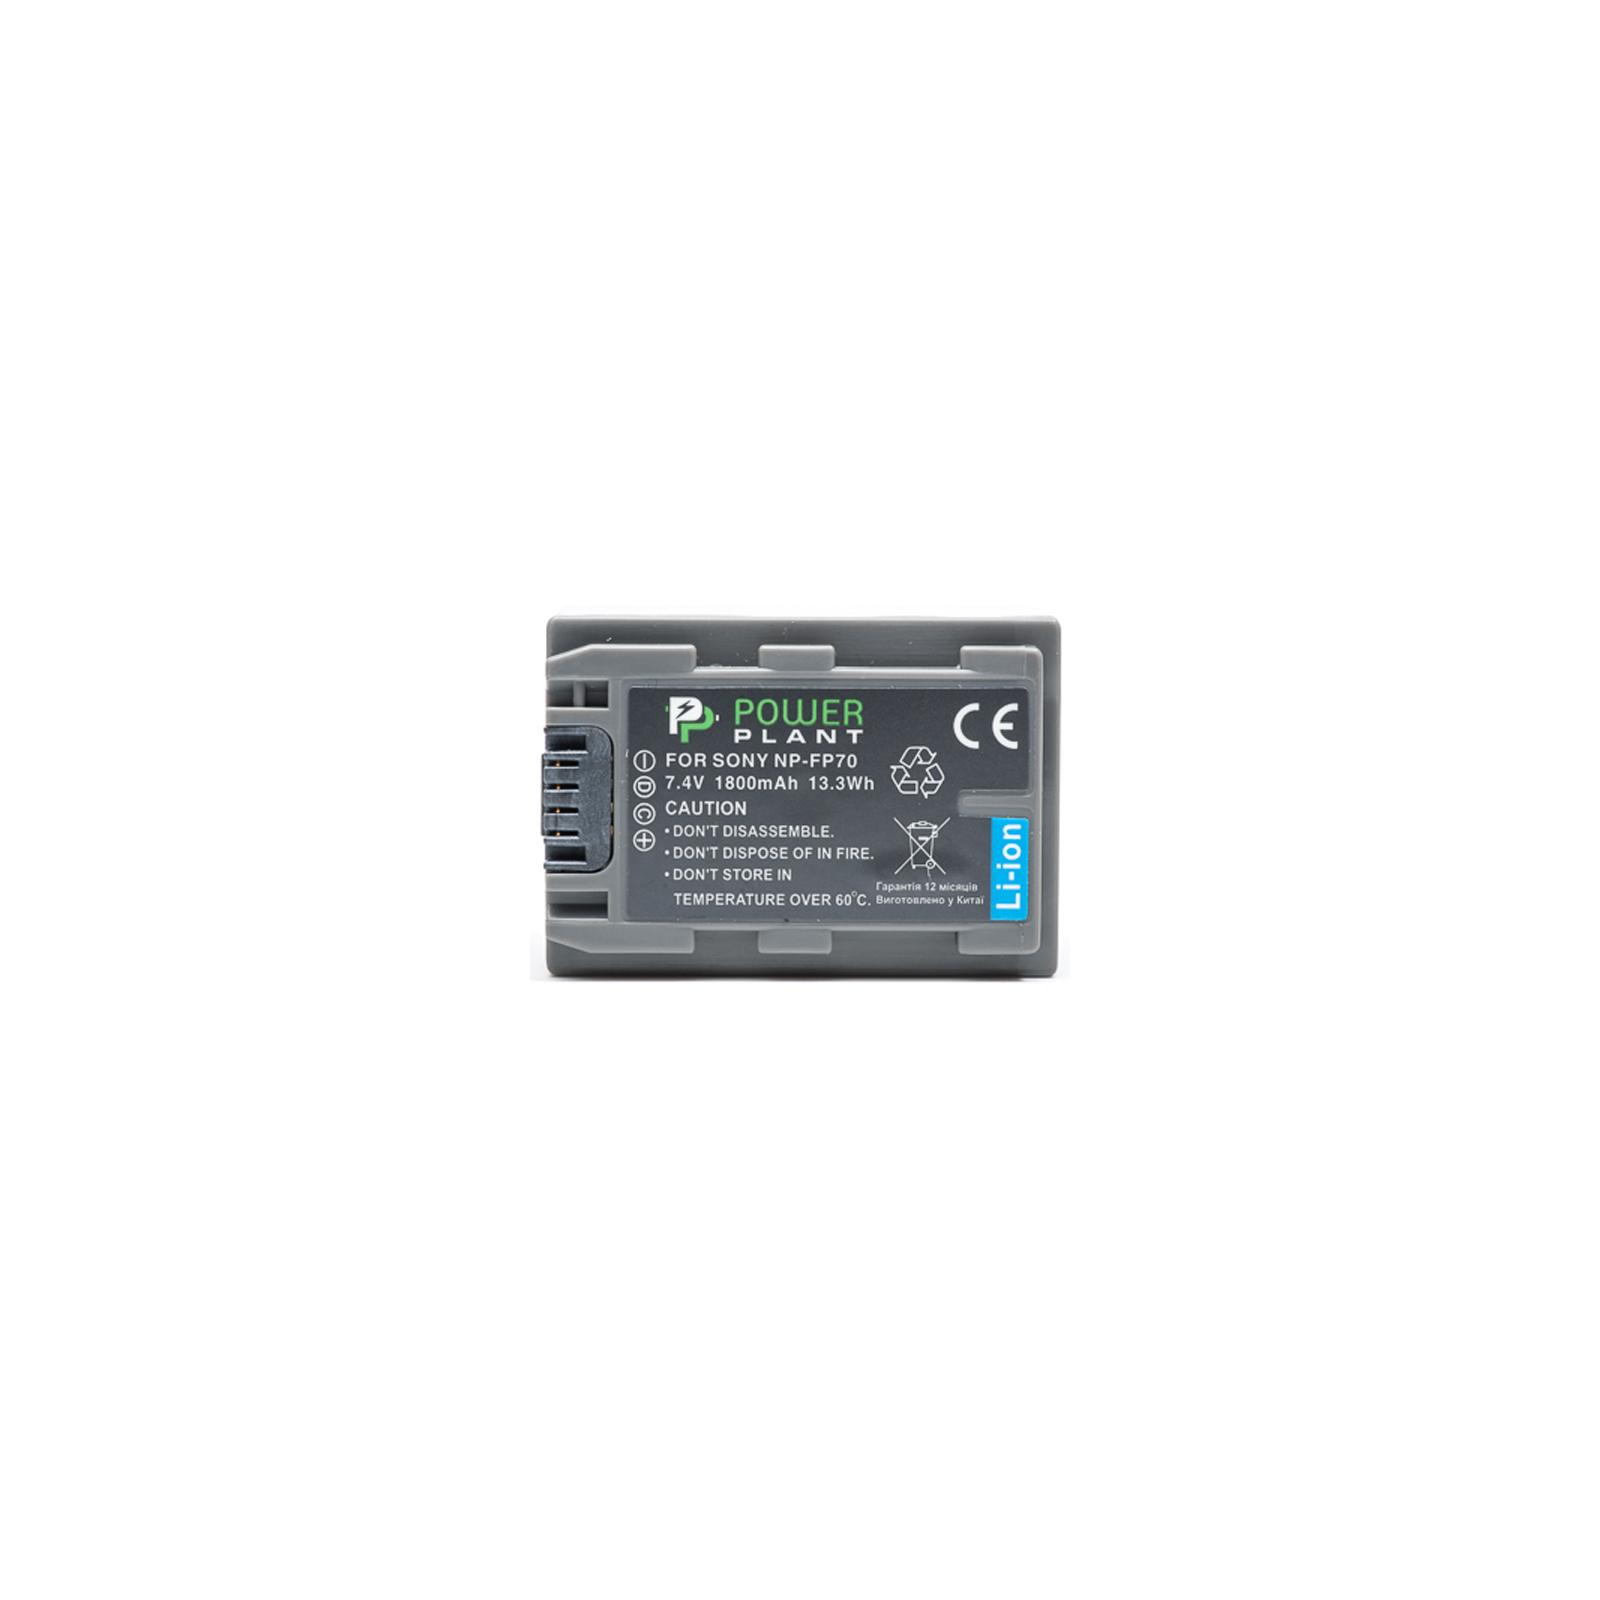 Аккумулятор к фото/видео PowerPlant Sony NP-FP70 (DV00DV1026) изображение 2